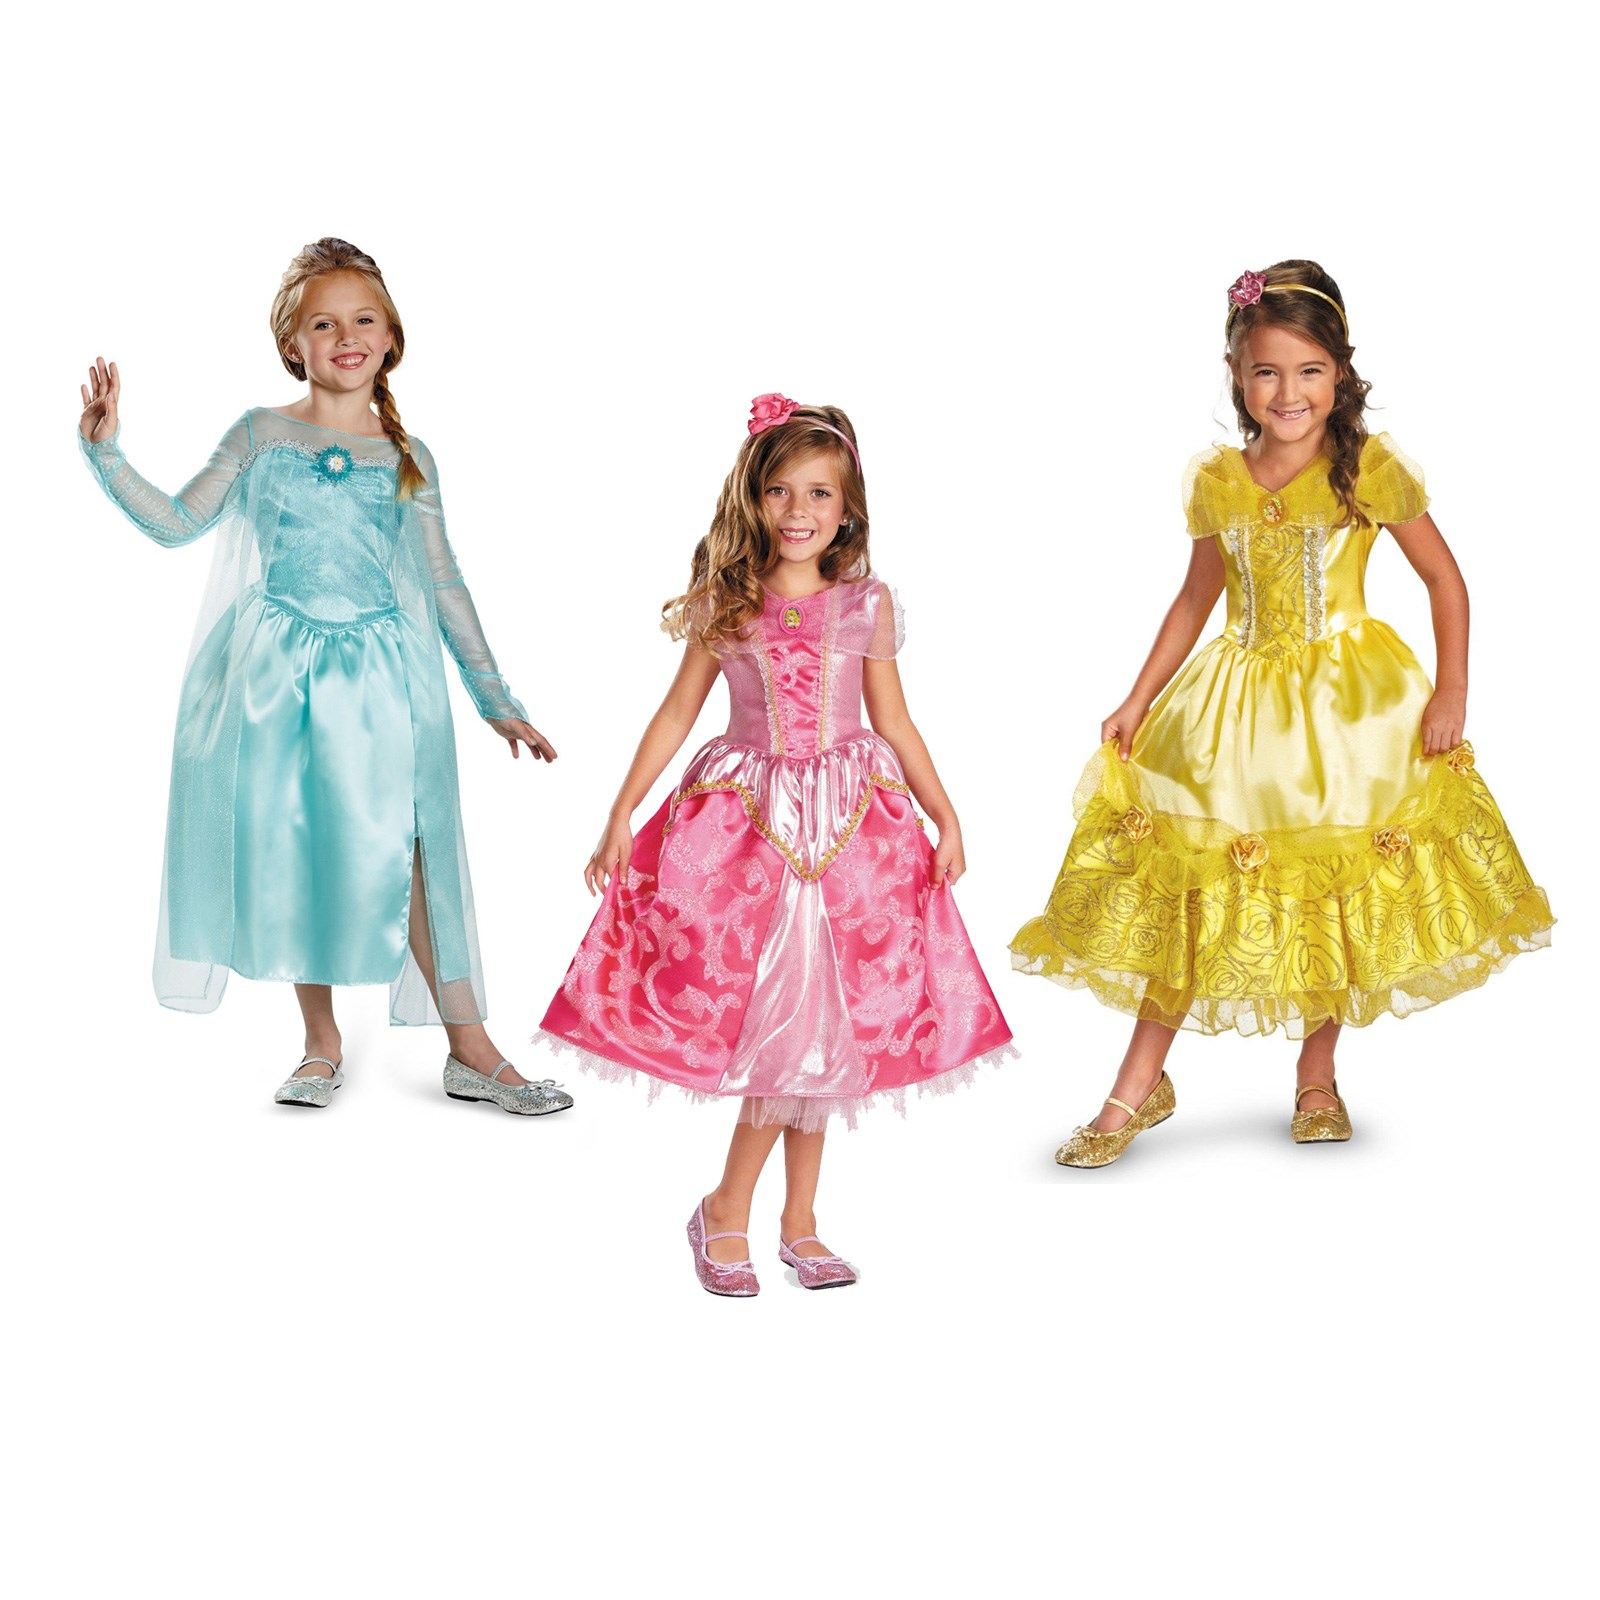 Girl Dressed up as a Boy Costume Girls Disney Princess Dress-up